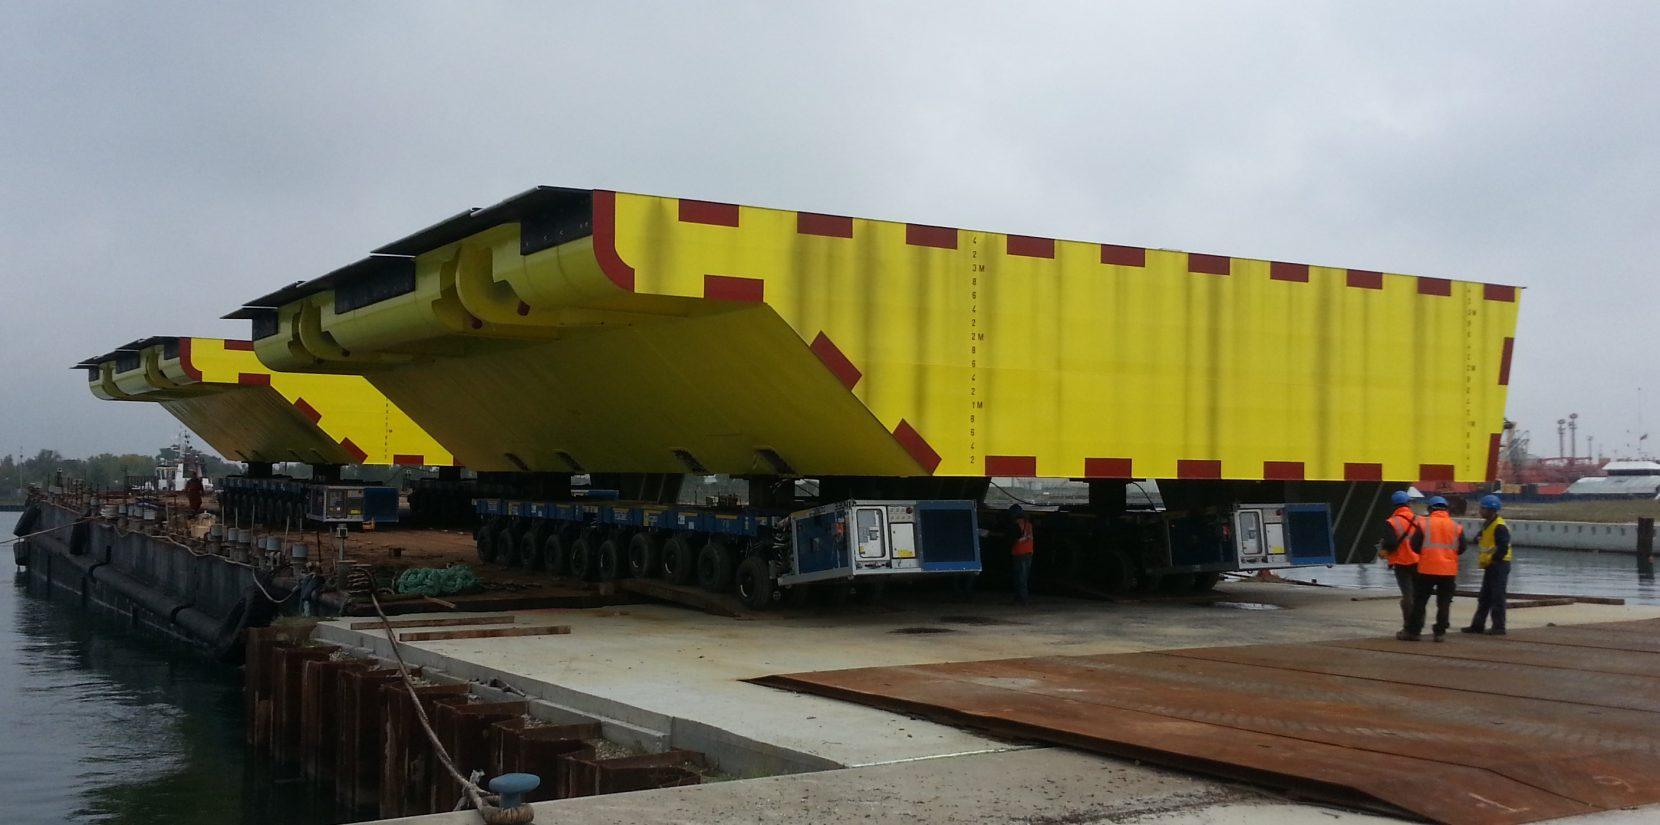 Flattop barge 'Leonardo' for sale / 60 x 20m / Ballastable / DWT 3,230